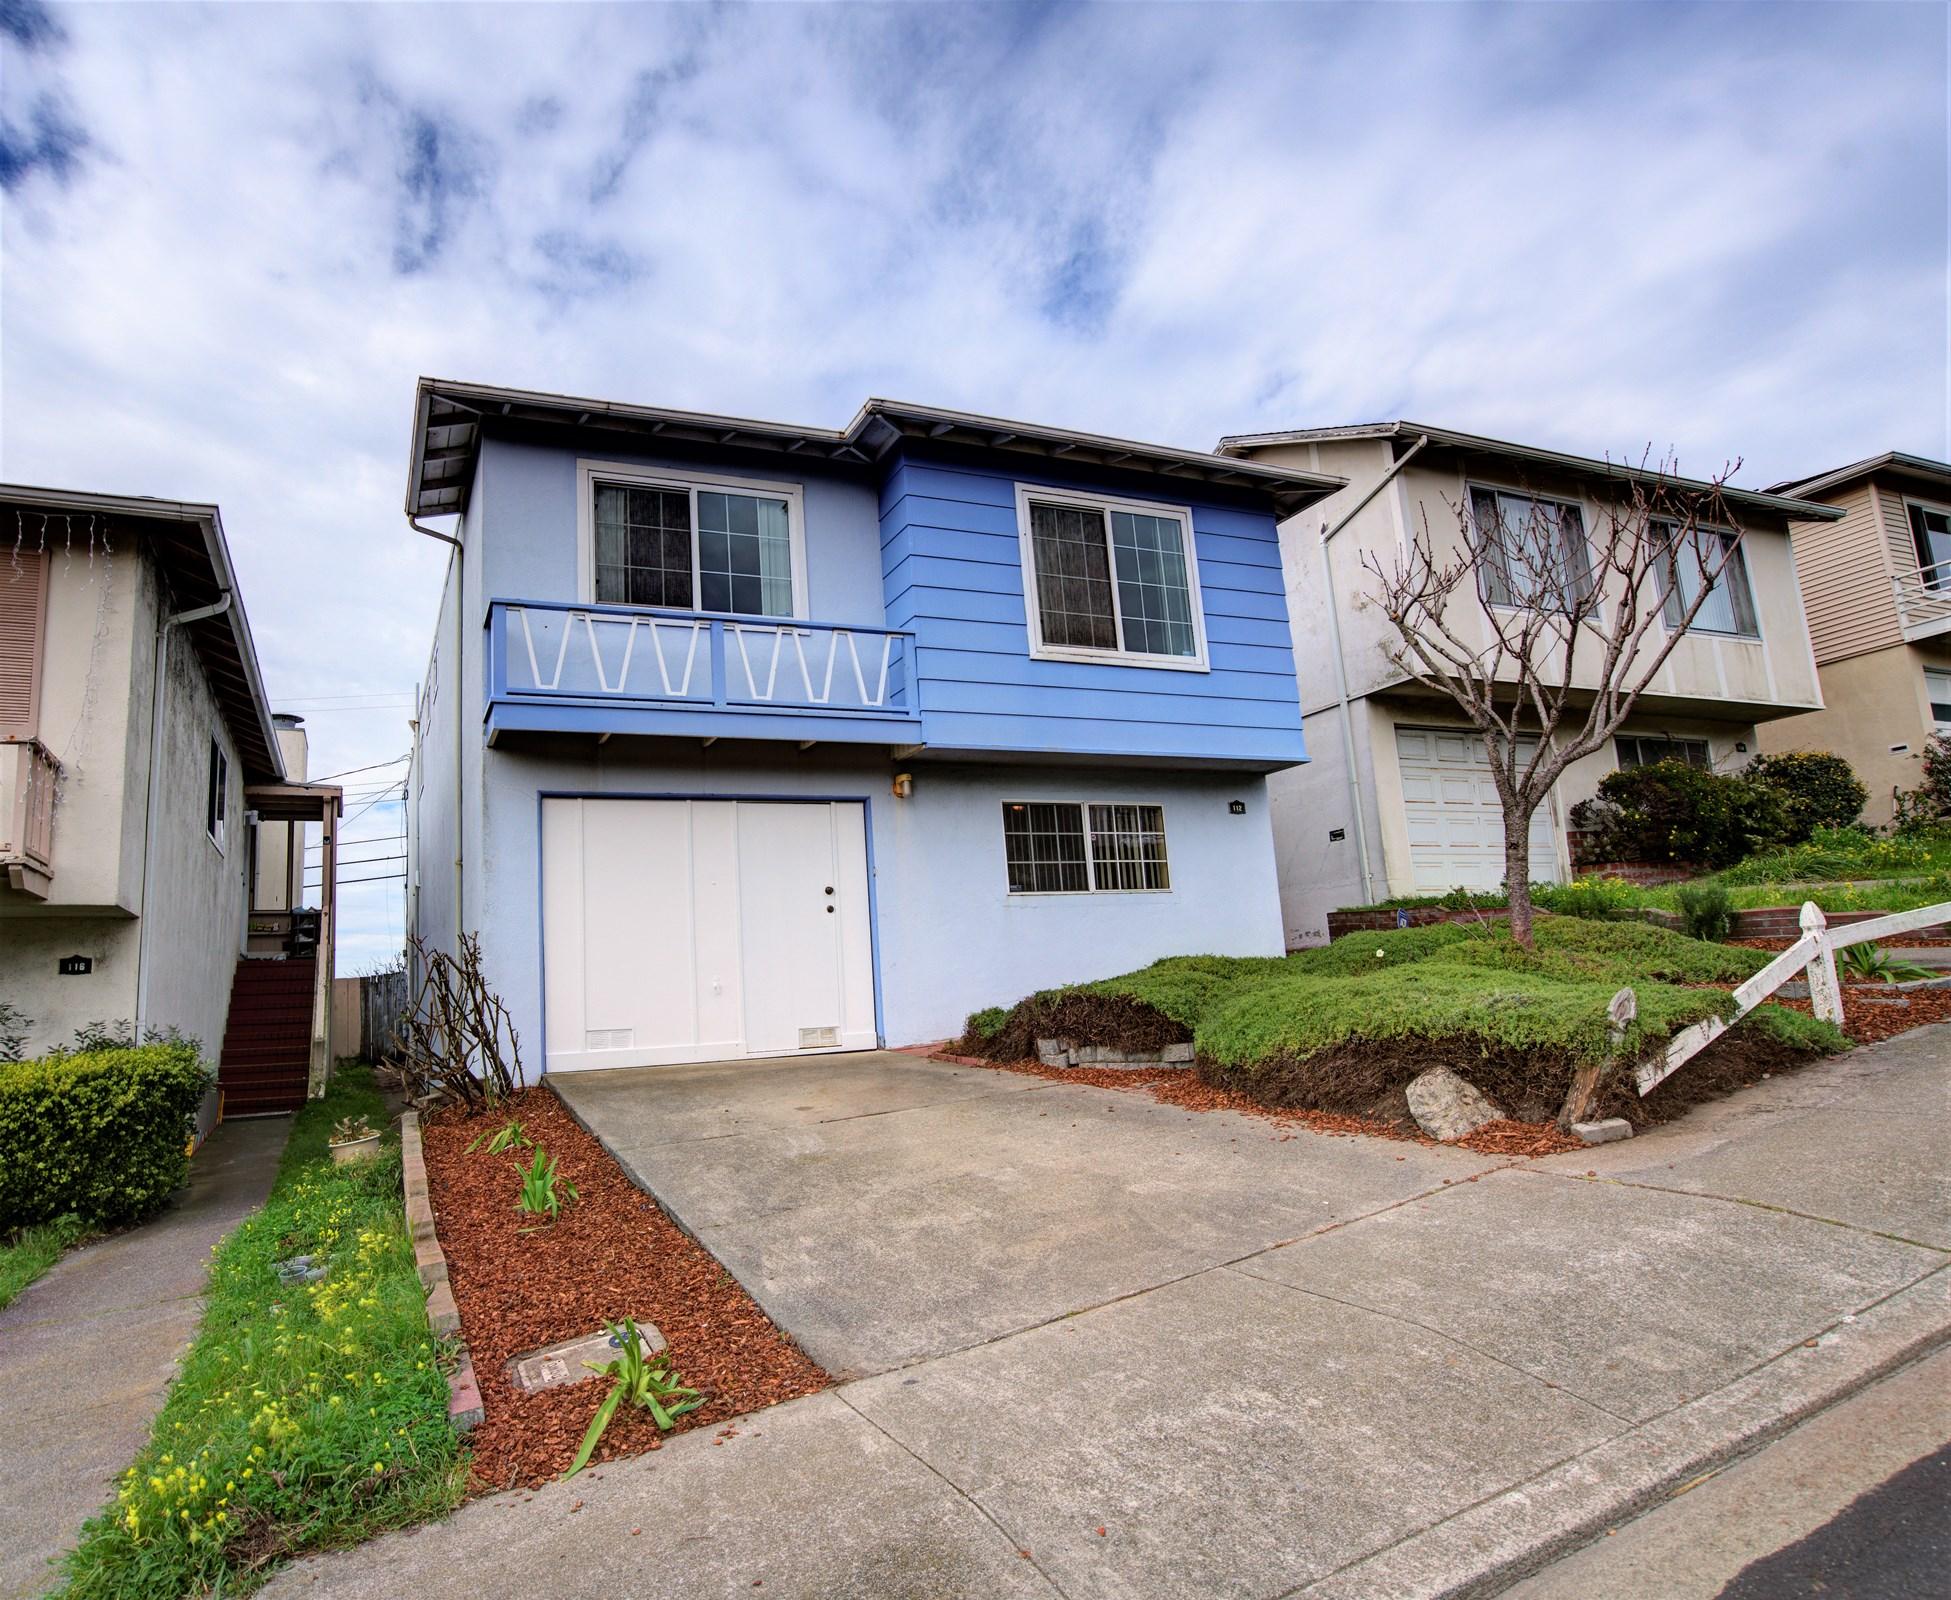 112 Longview Dr, Daly City, CA 94015